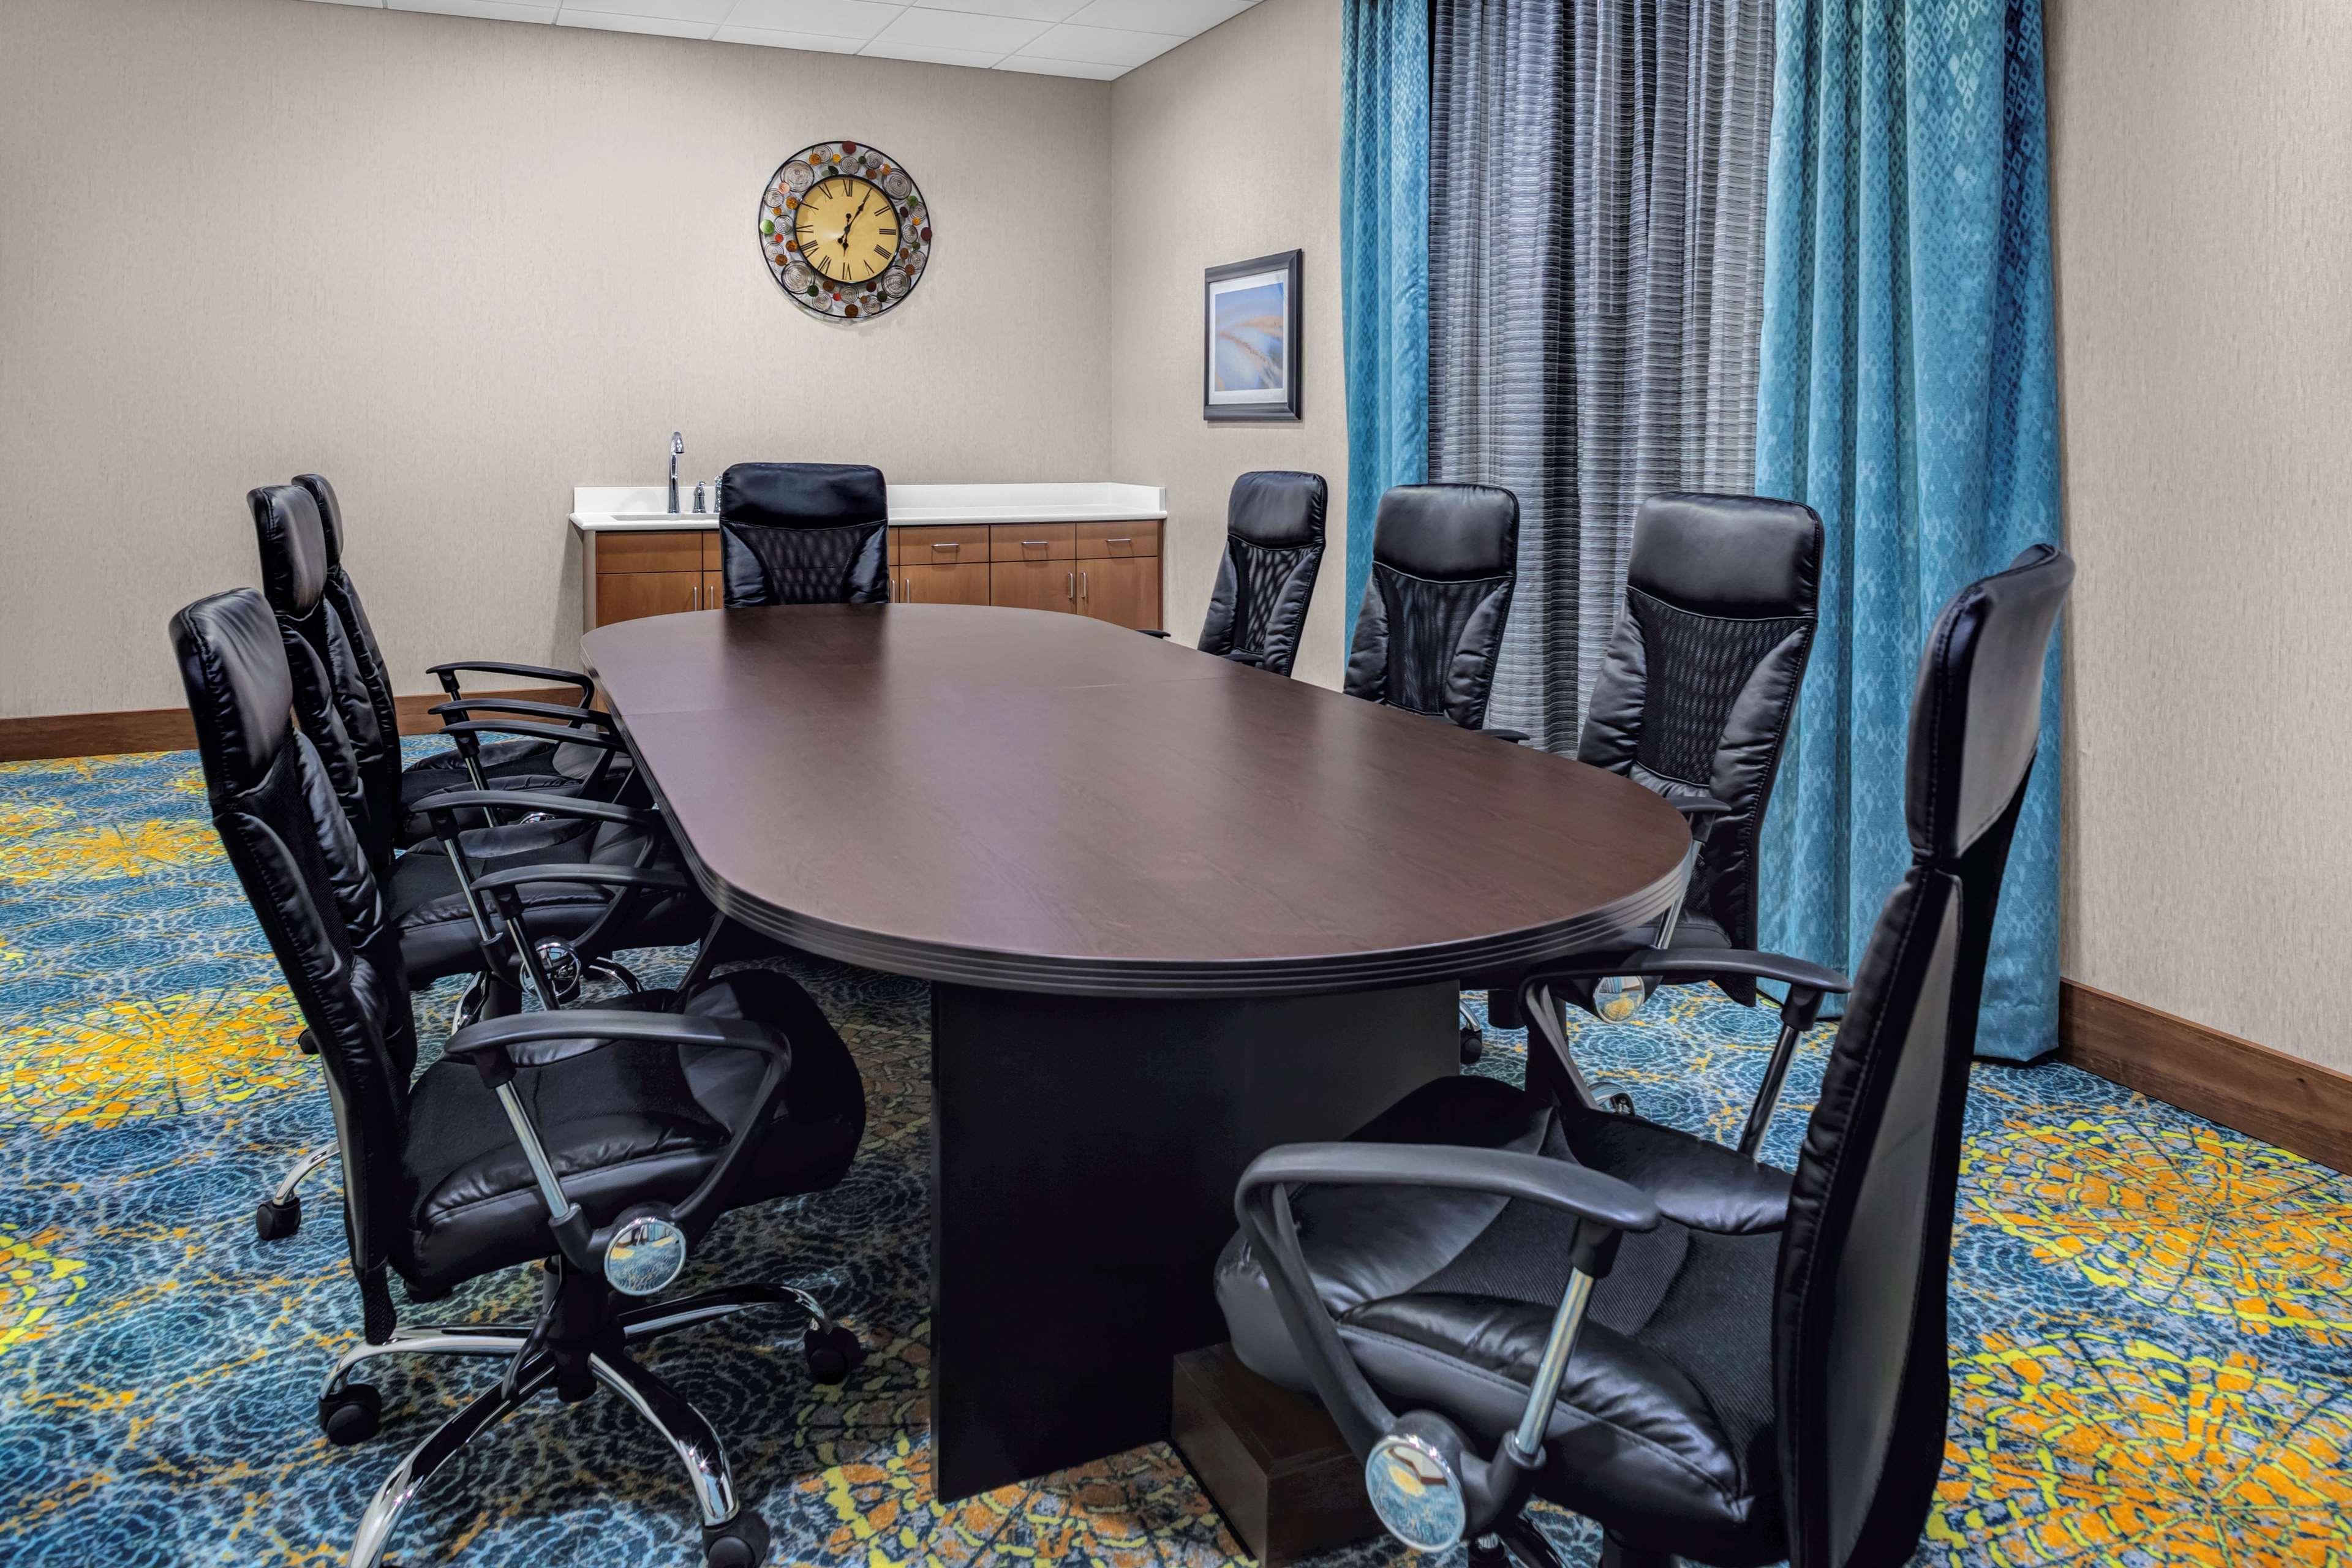 Homewood Suites by Hilton Wauwatosa Milwaukee image 21